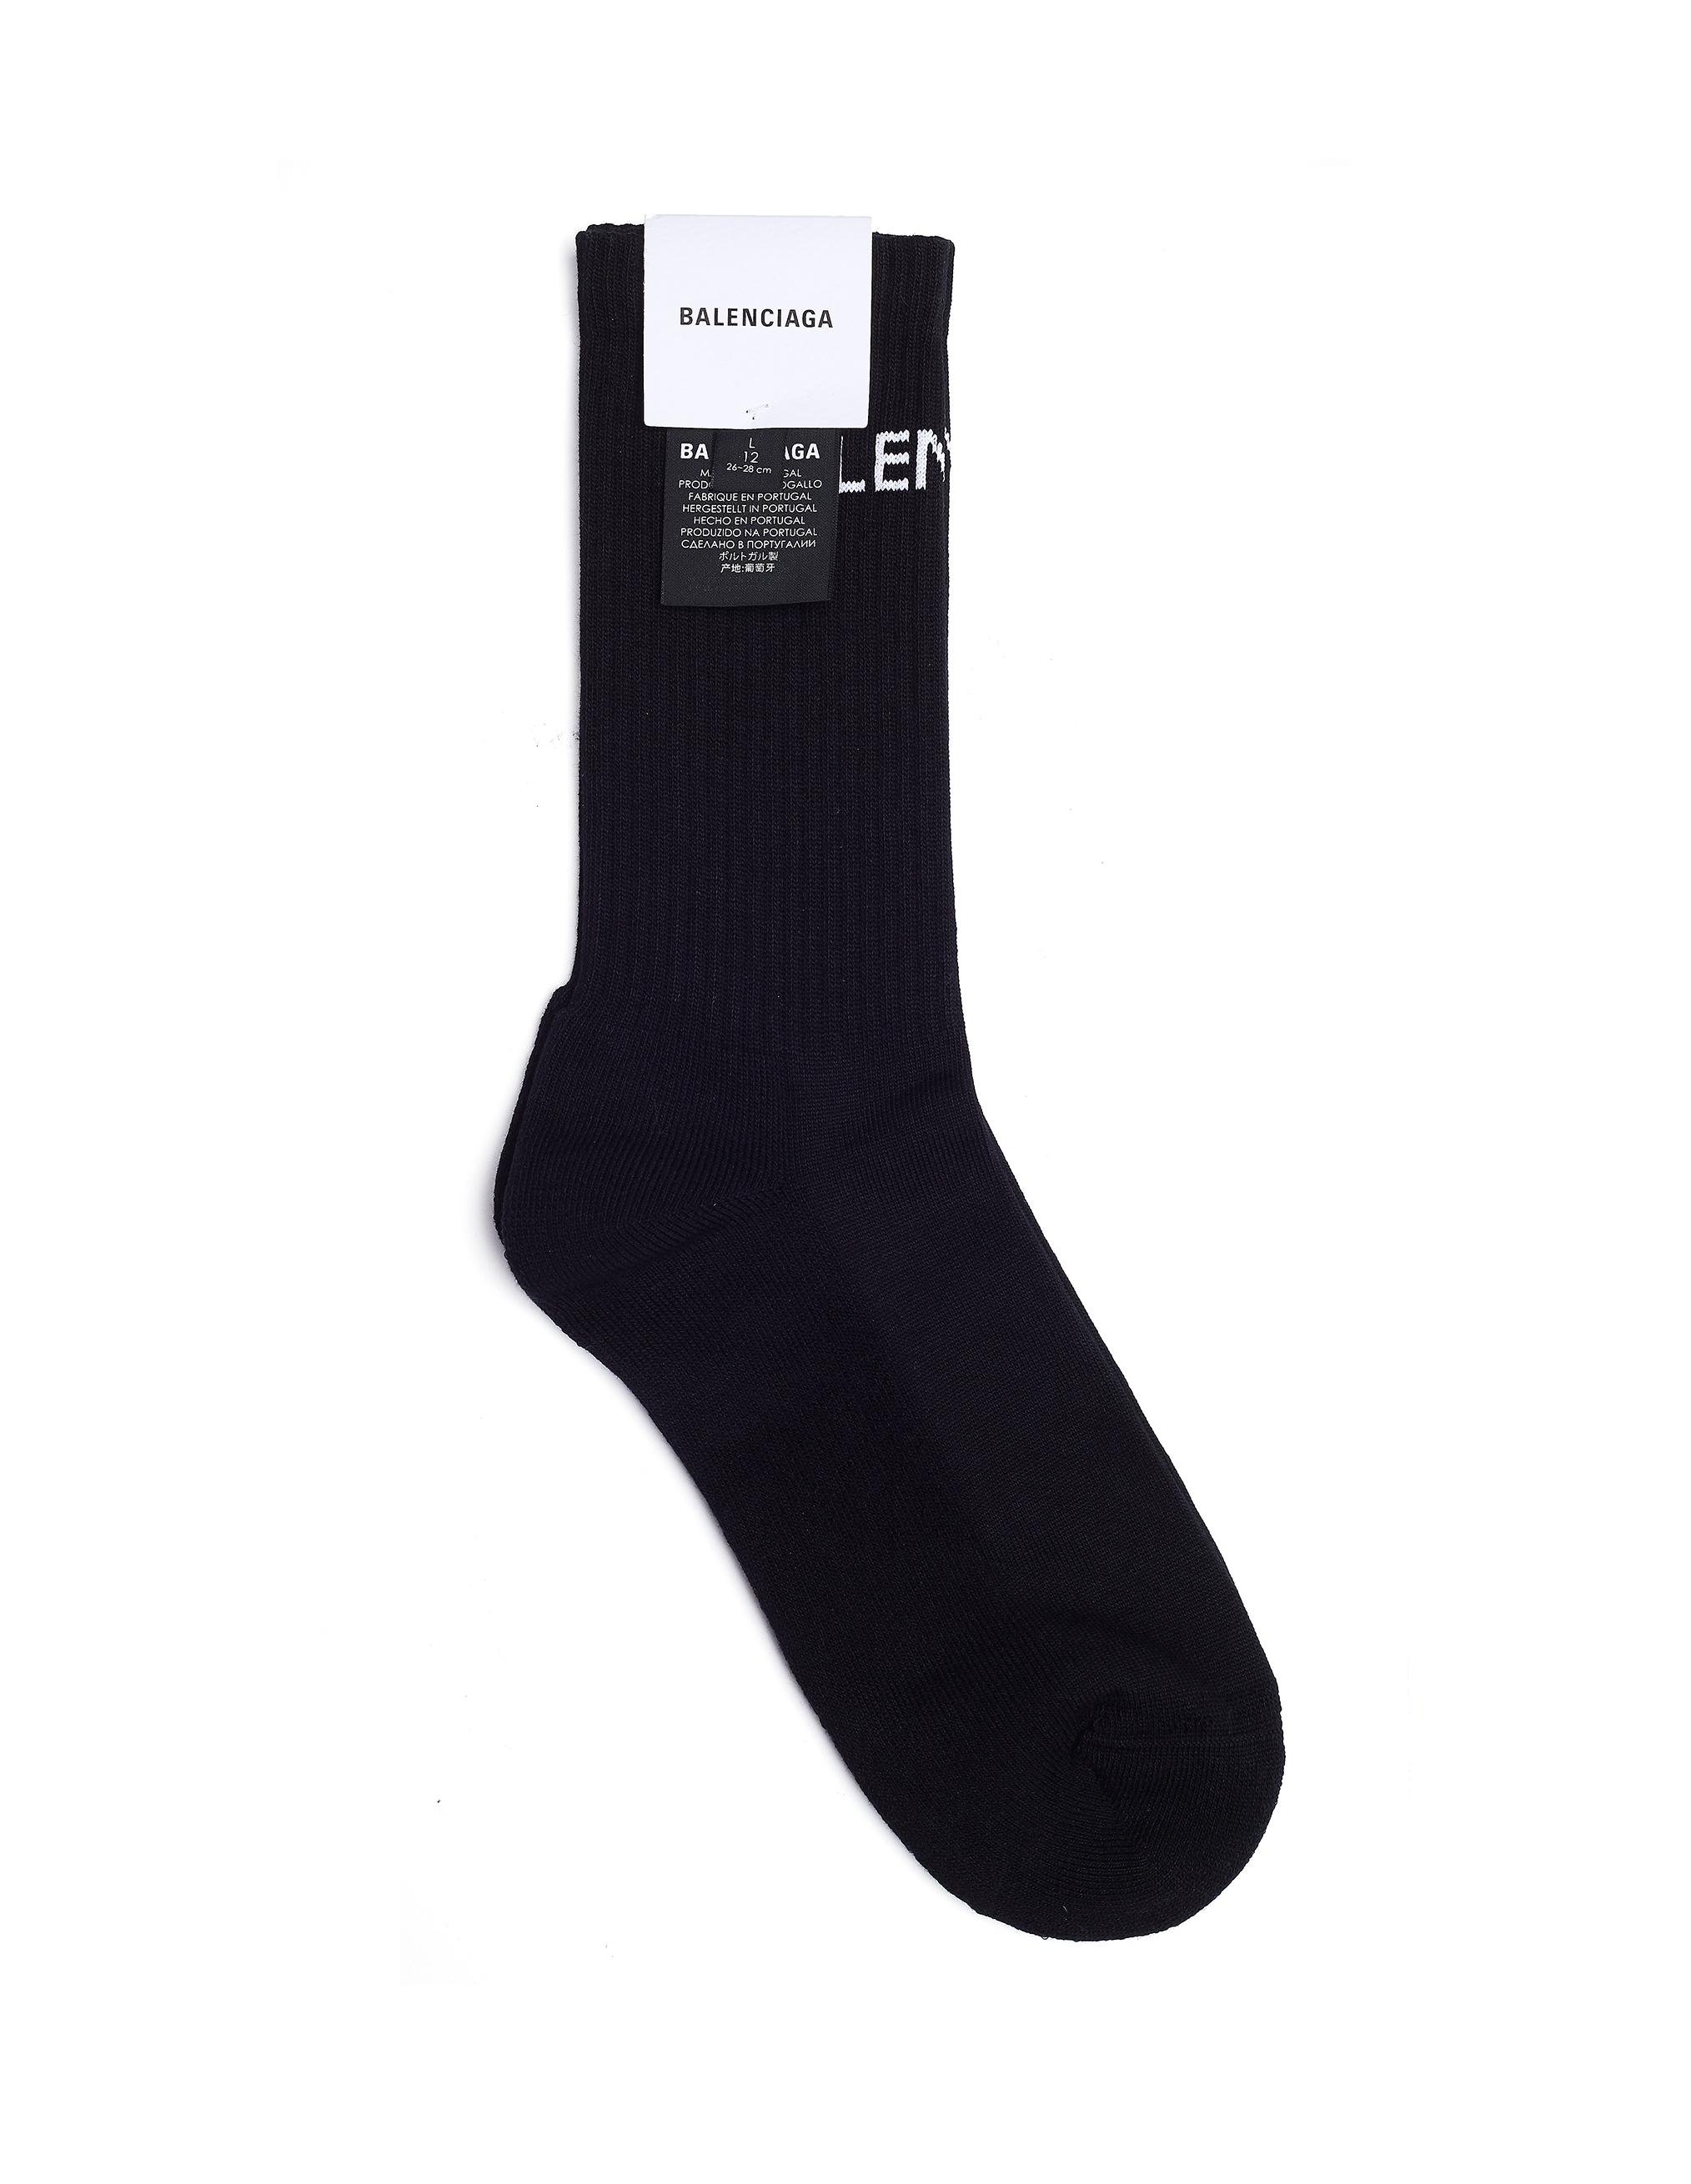 Balenciaga Logo Crew Socks - black